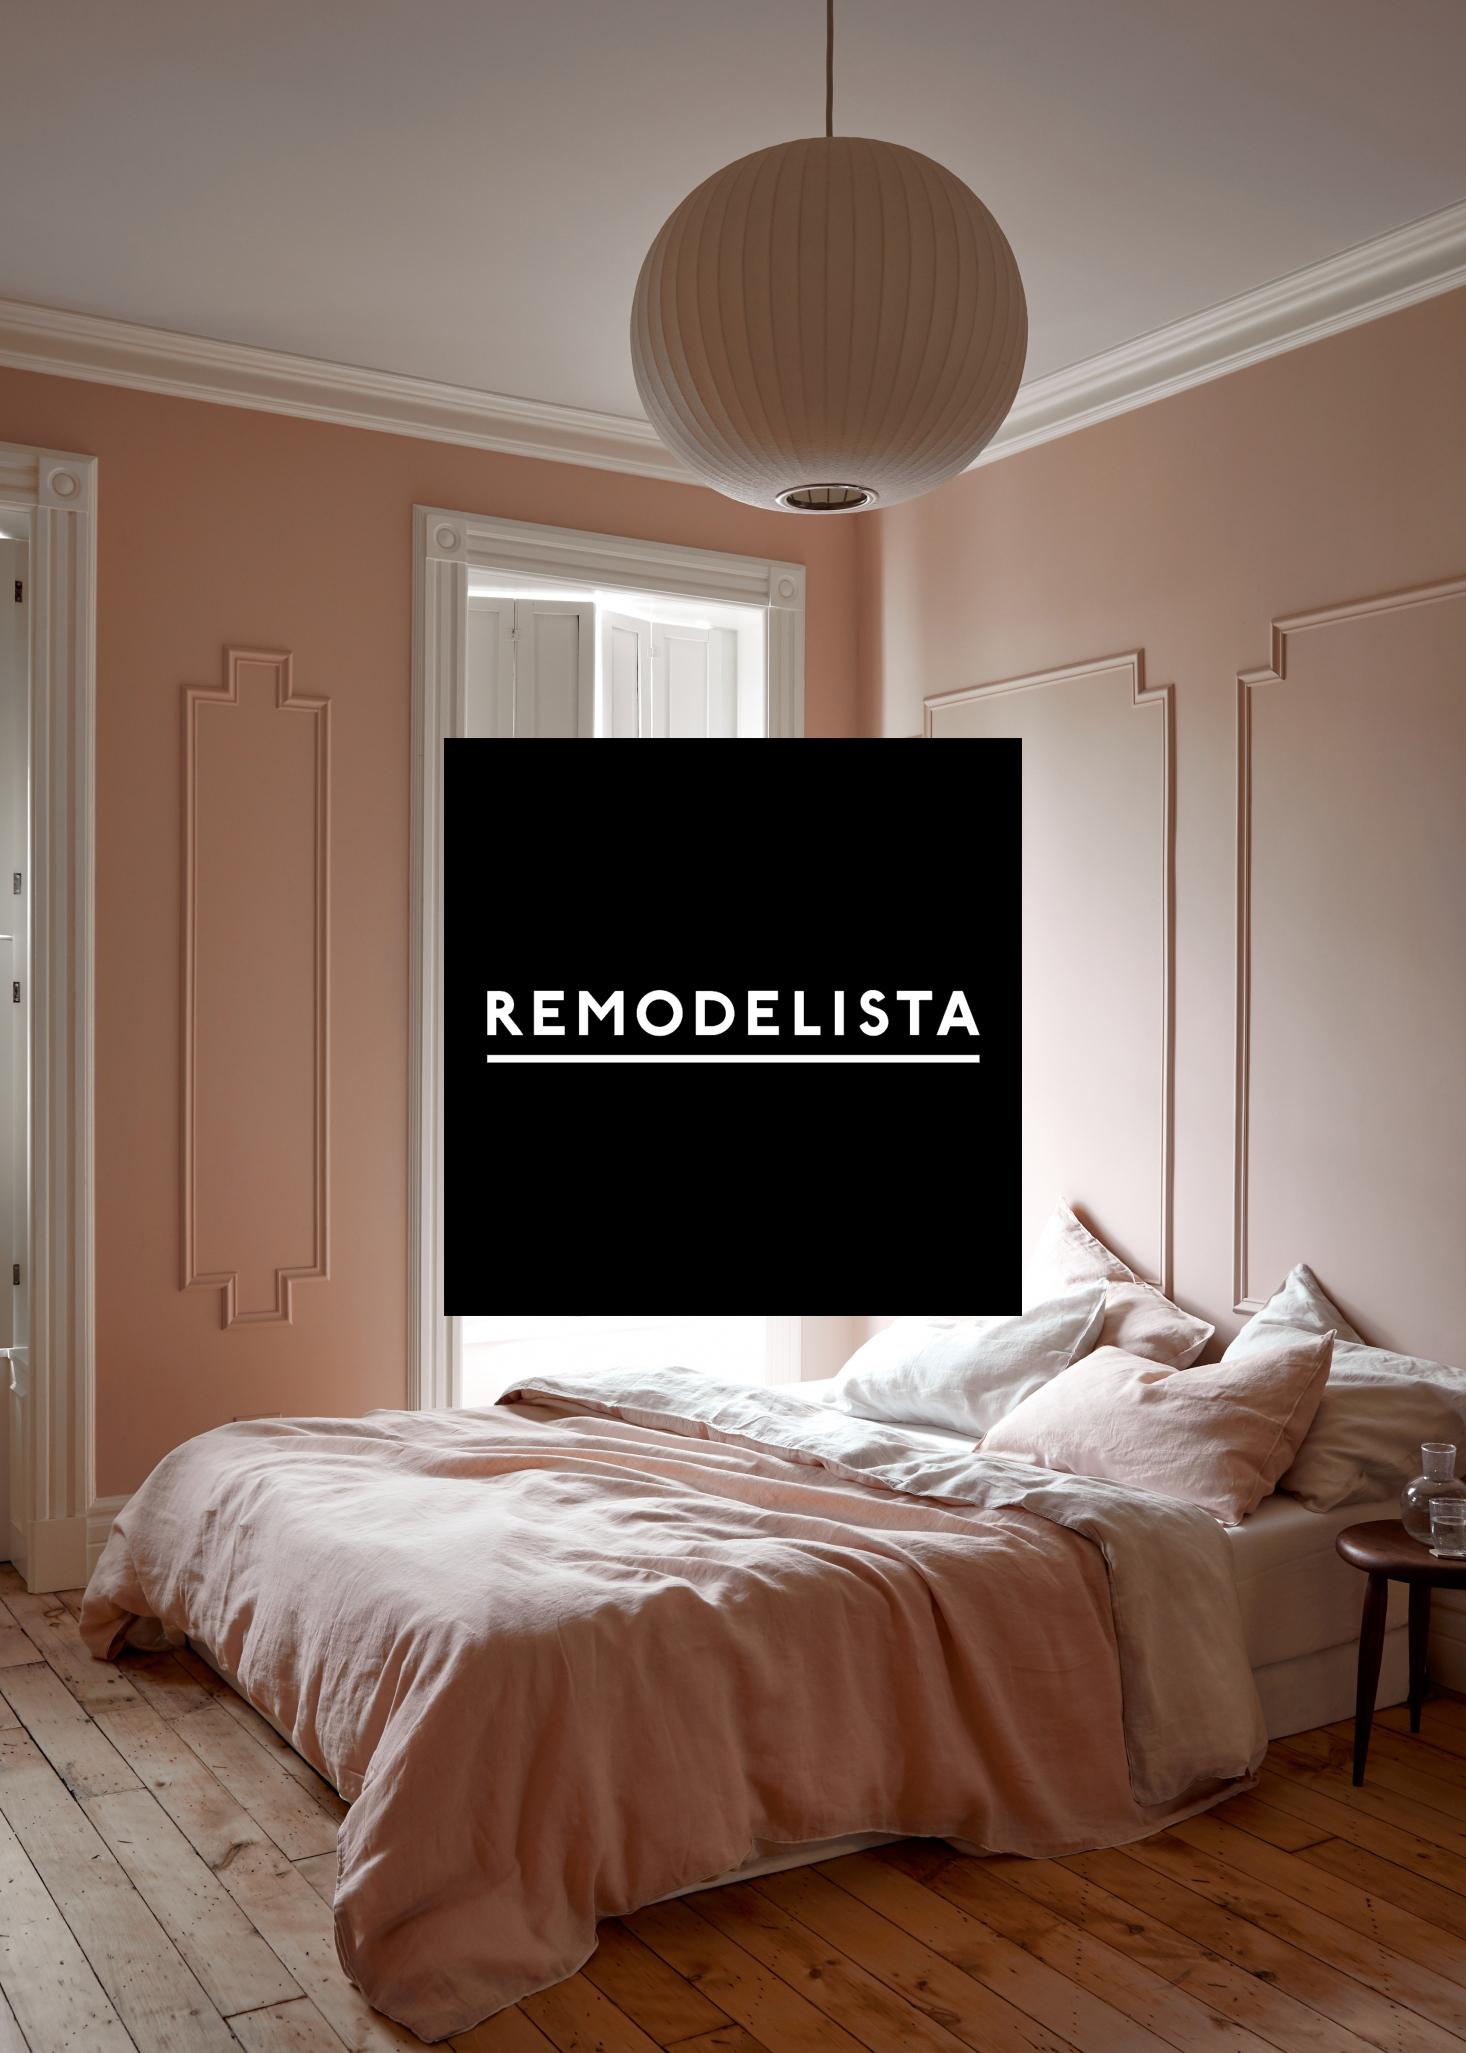 REMODELISTA - THE EXPERT IS IN, 2018